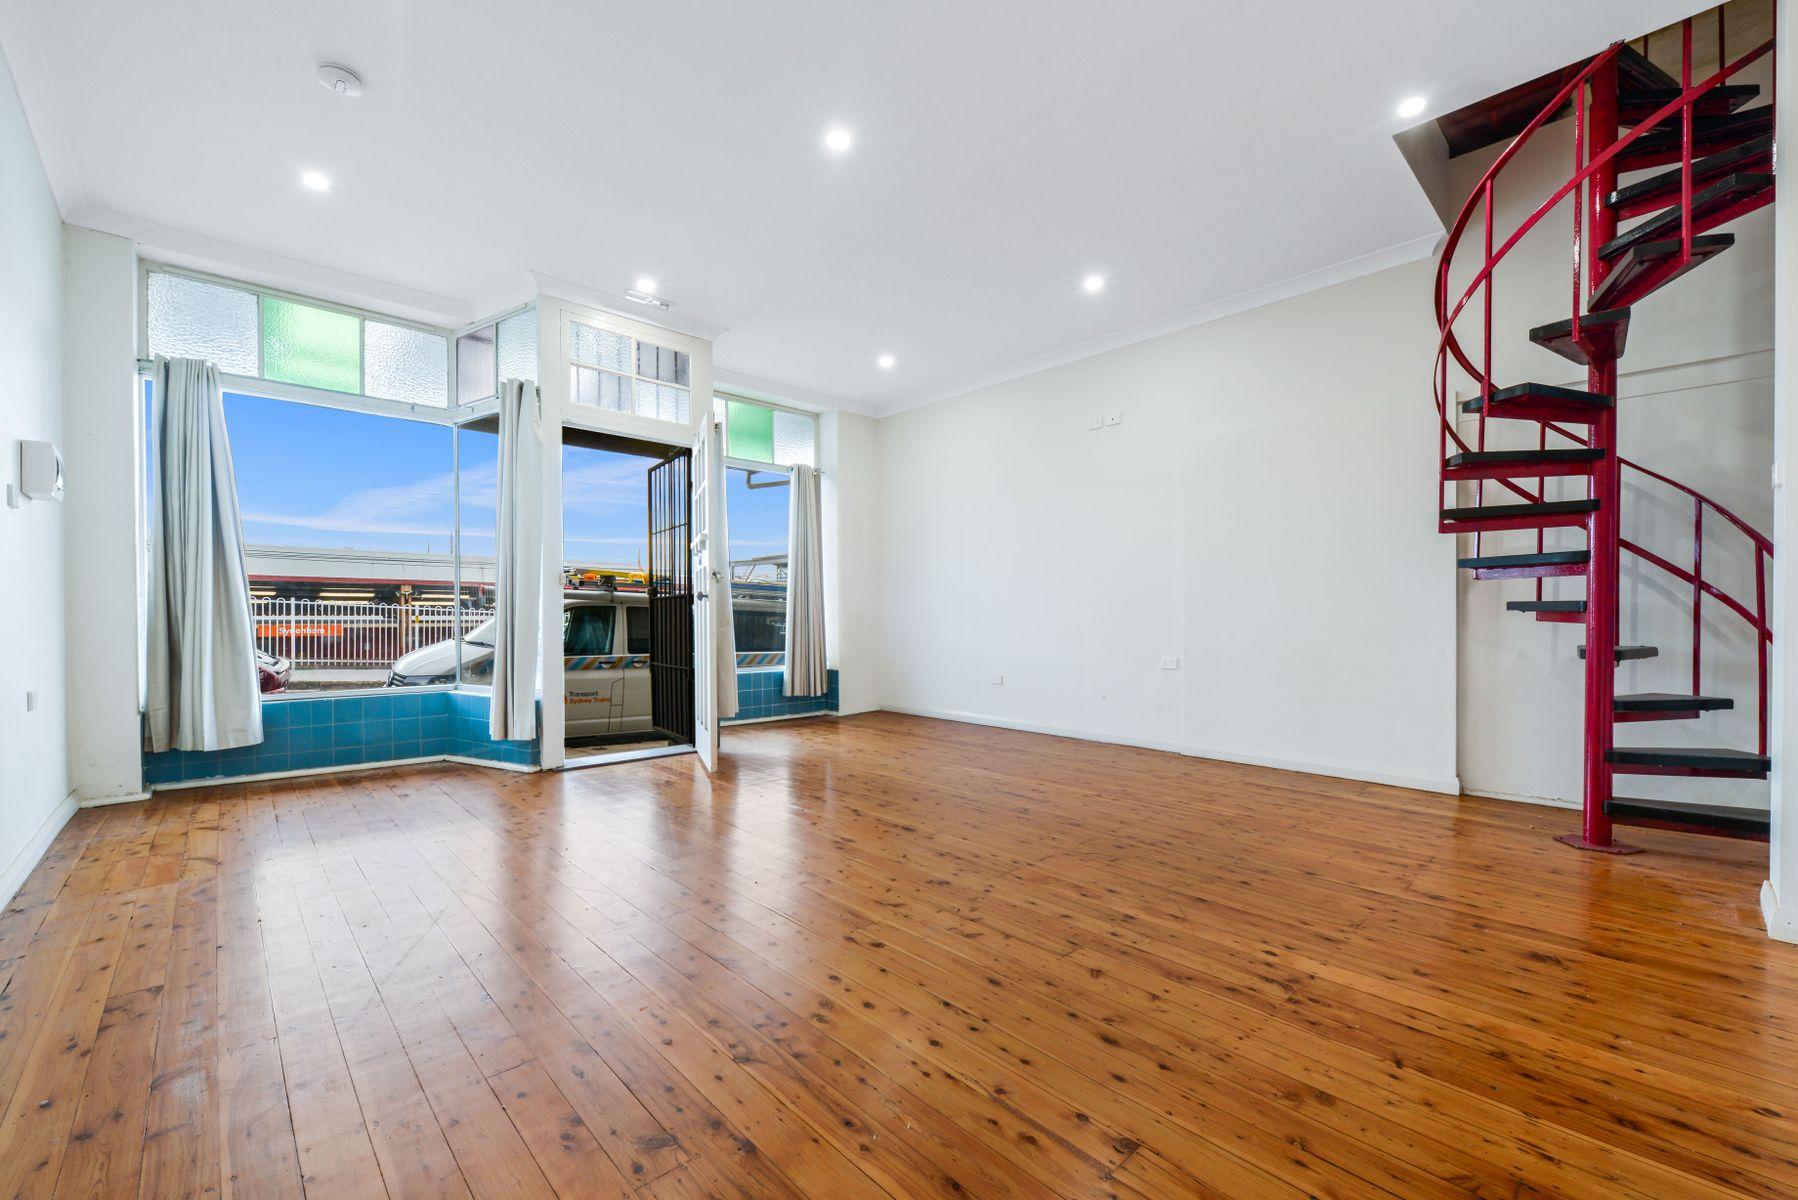 6 Burrows Avenue, Sydenham, NSW 2044